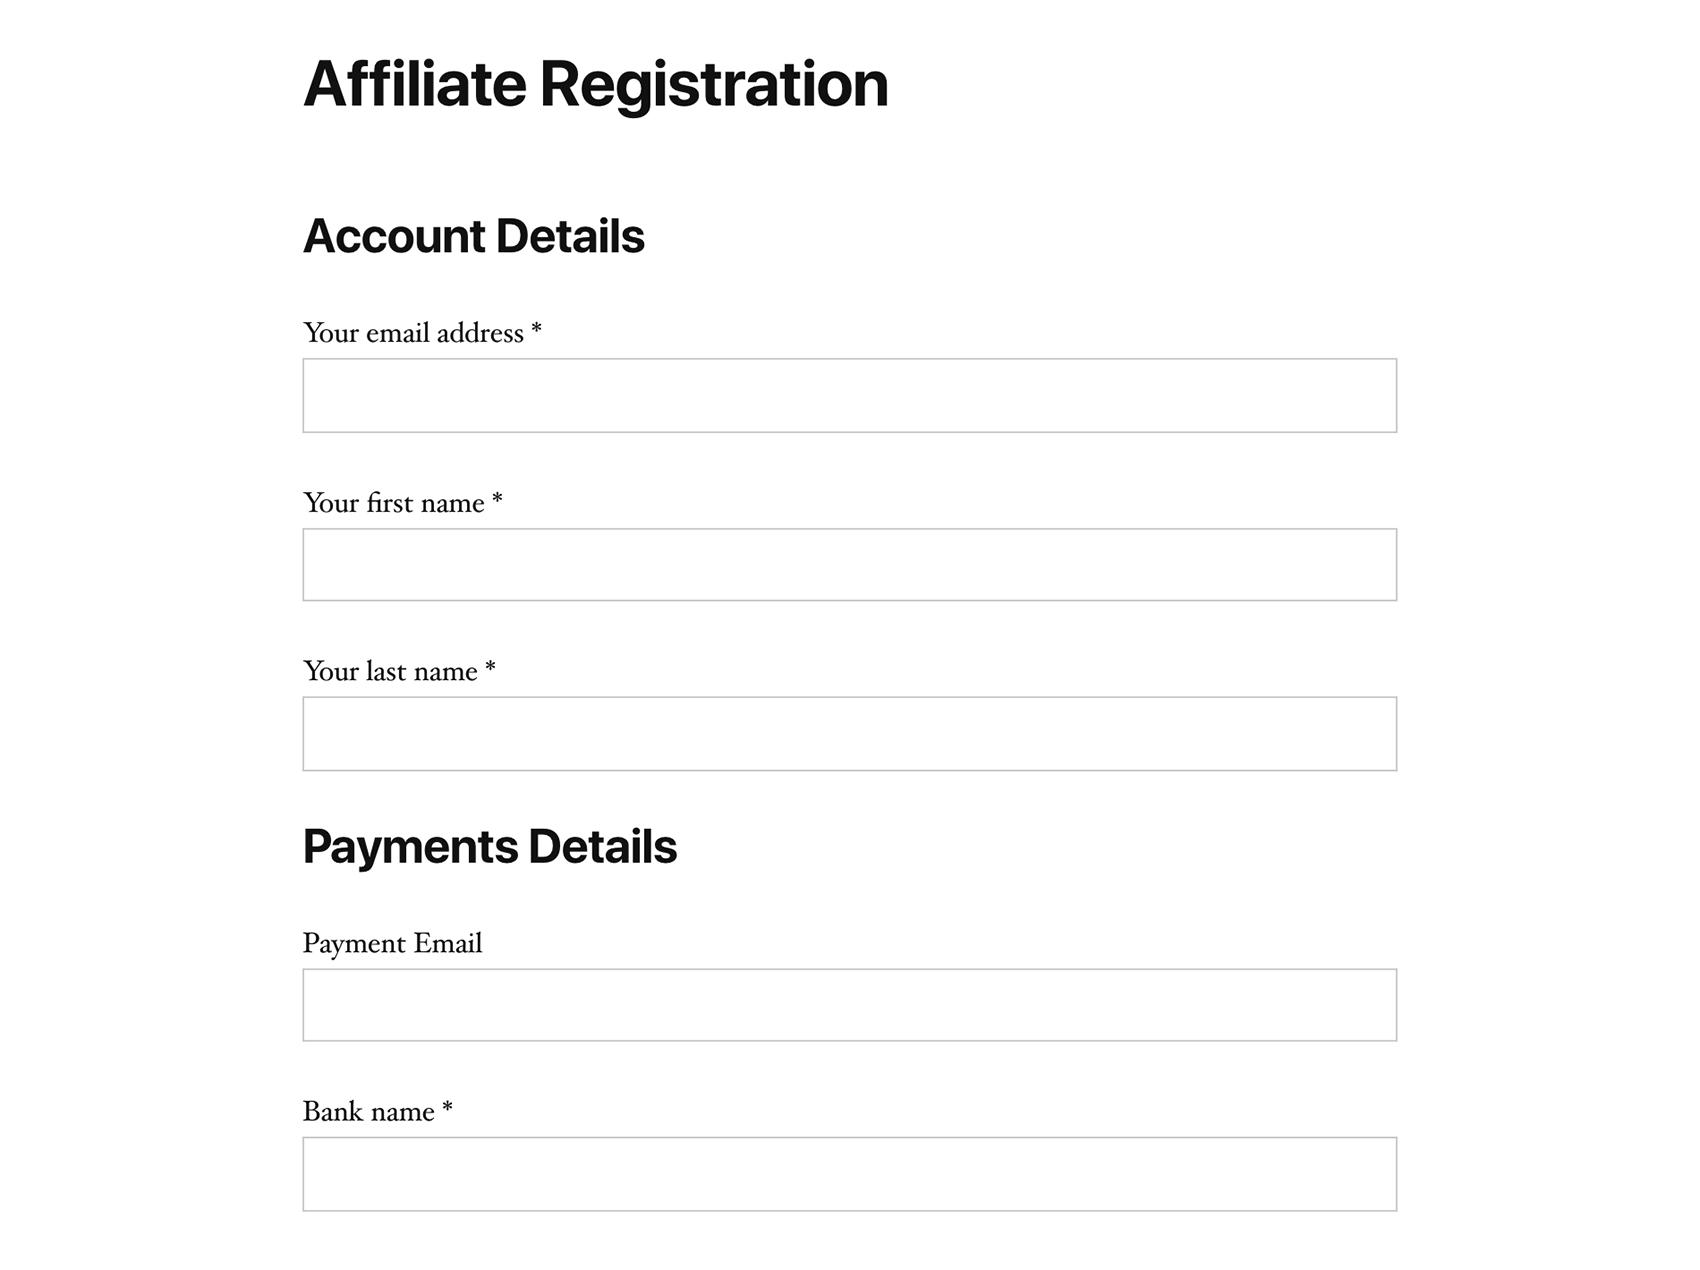 Affiliate registration form on a WordPress website, using SliceWP.